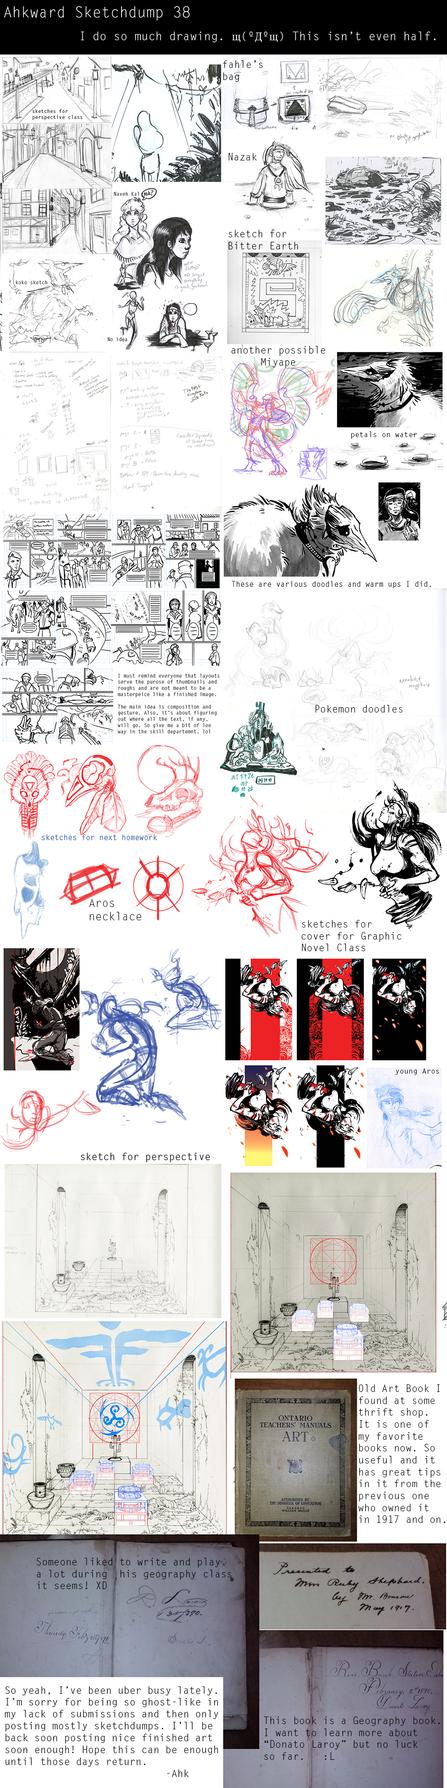 Sketchdump #38 - School and On by Ahkward